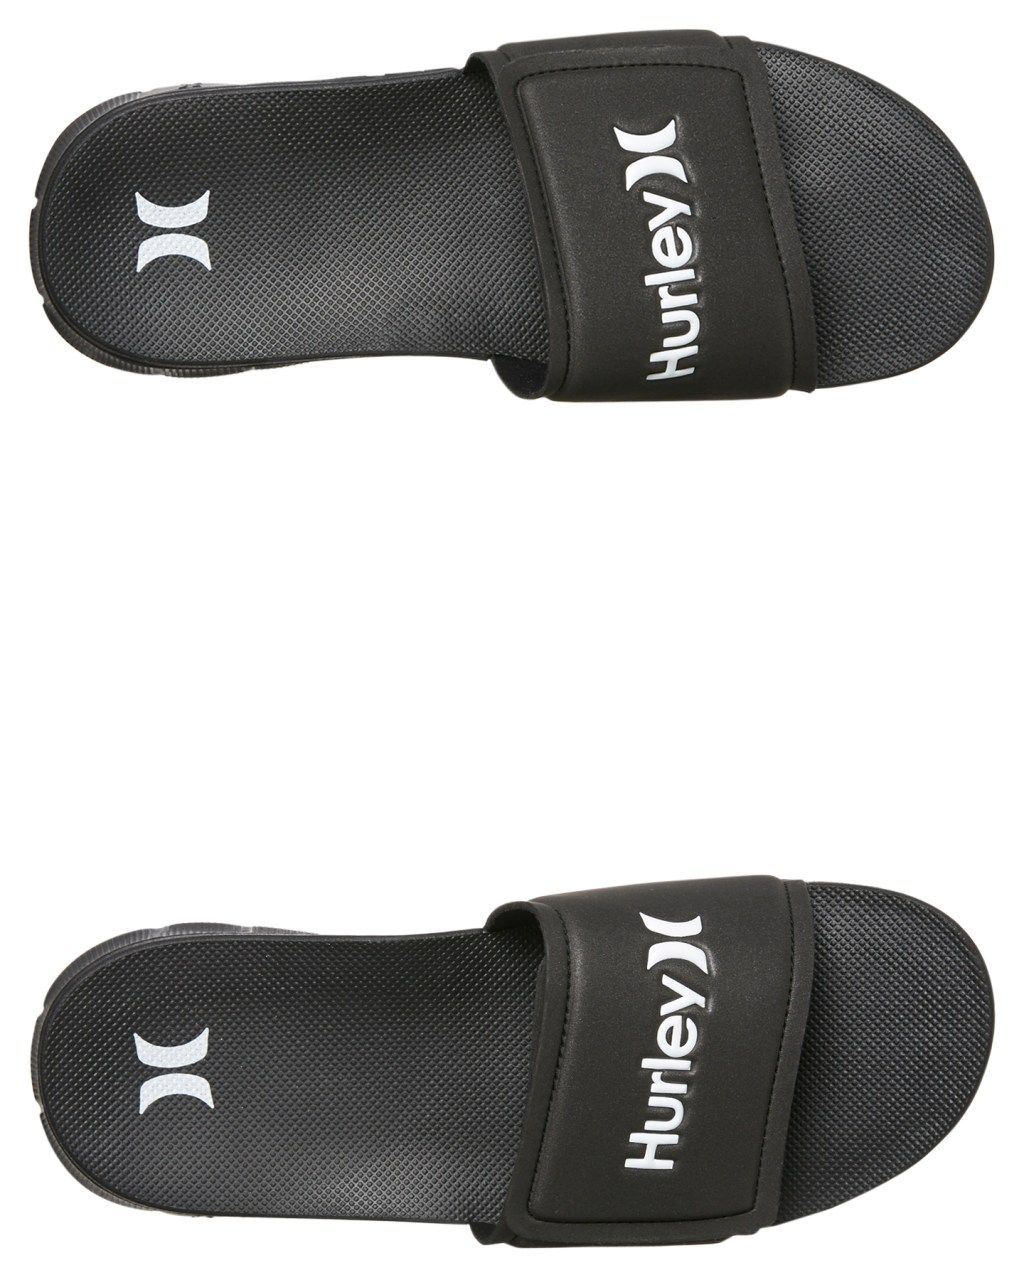 66e261abdaa6 Hurley Fusion 2 Slide Black Mens Walking   Hiking Boots Size 11 ...